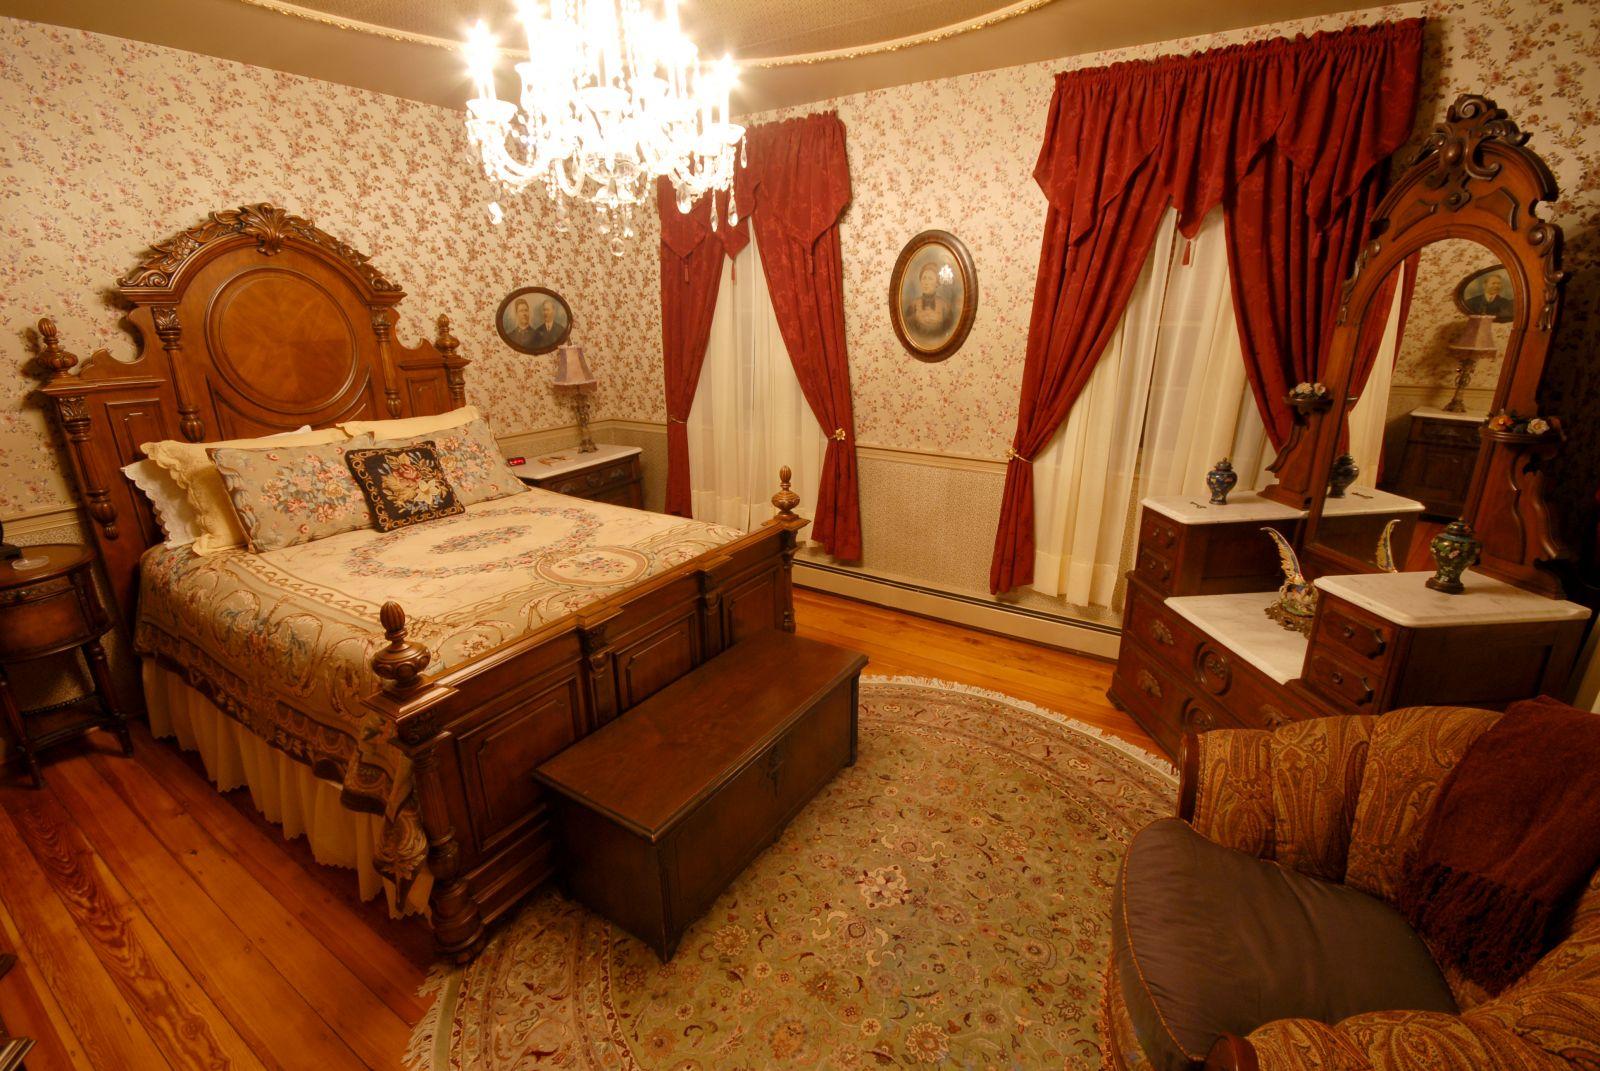 Desain Kamar Tidur Gaya Victorian